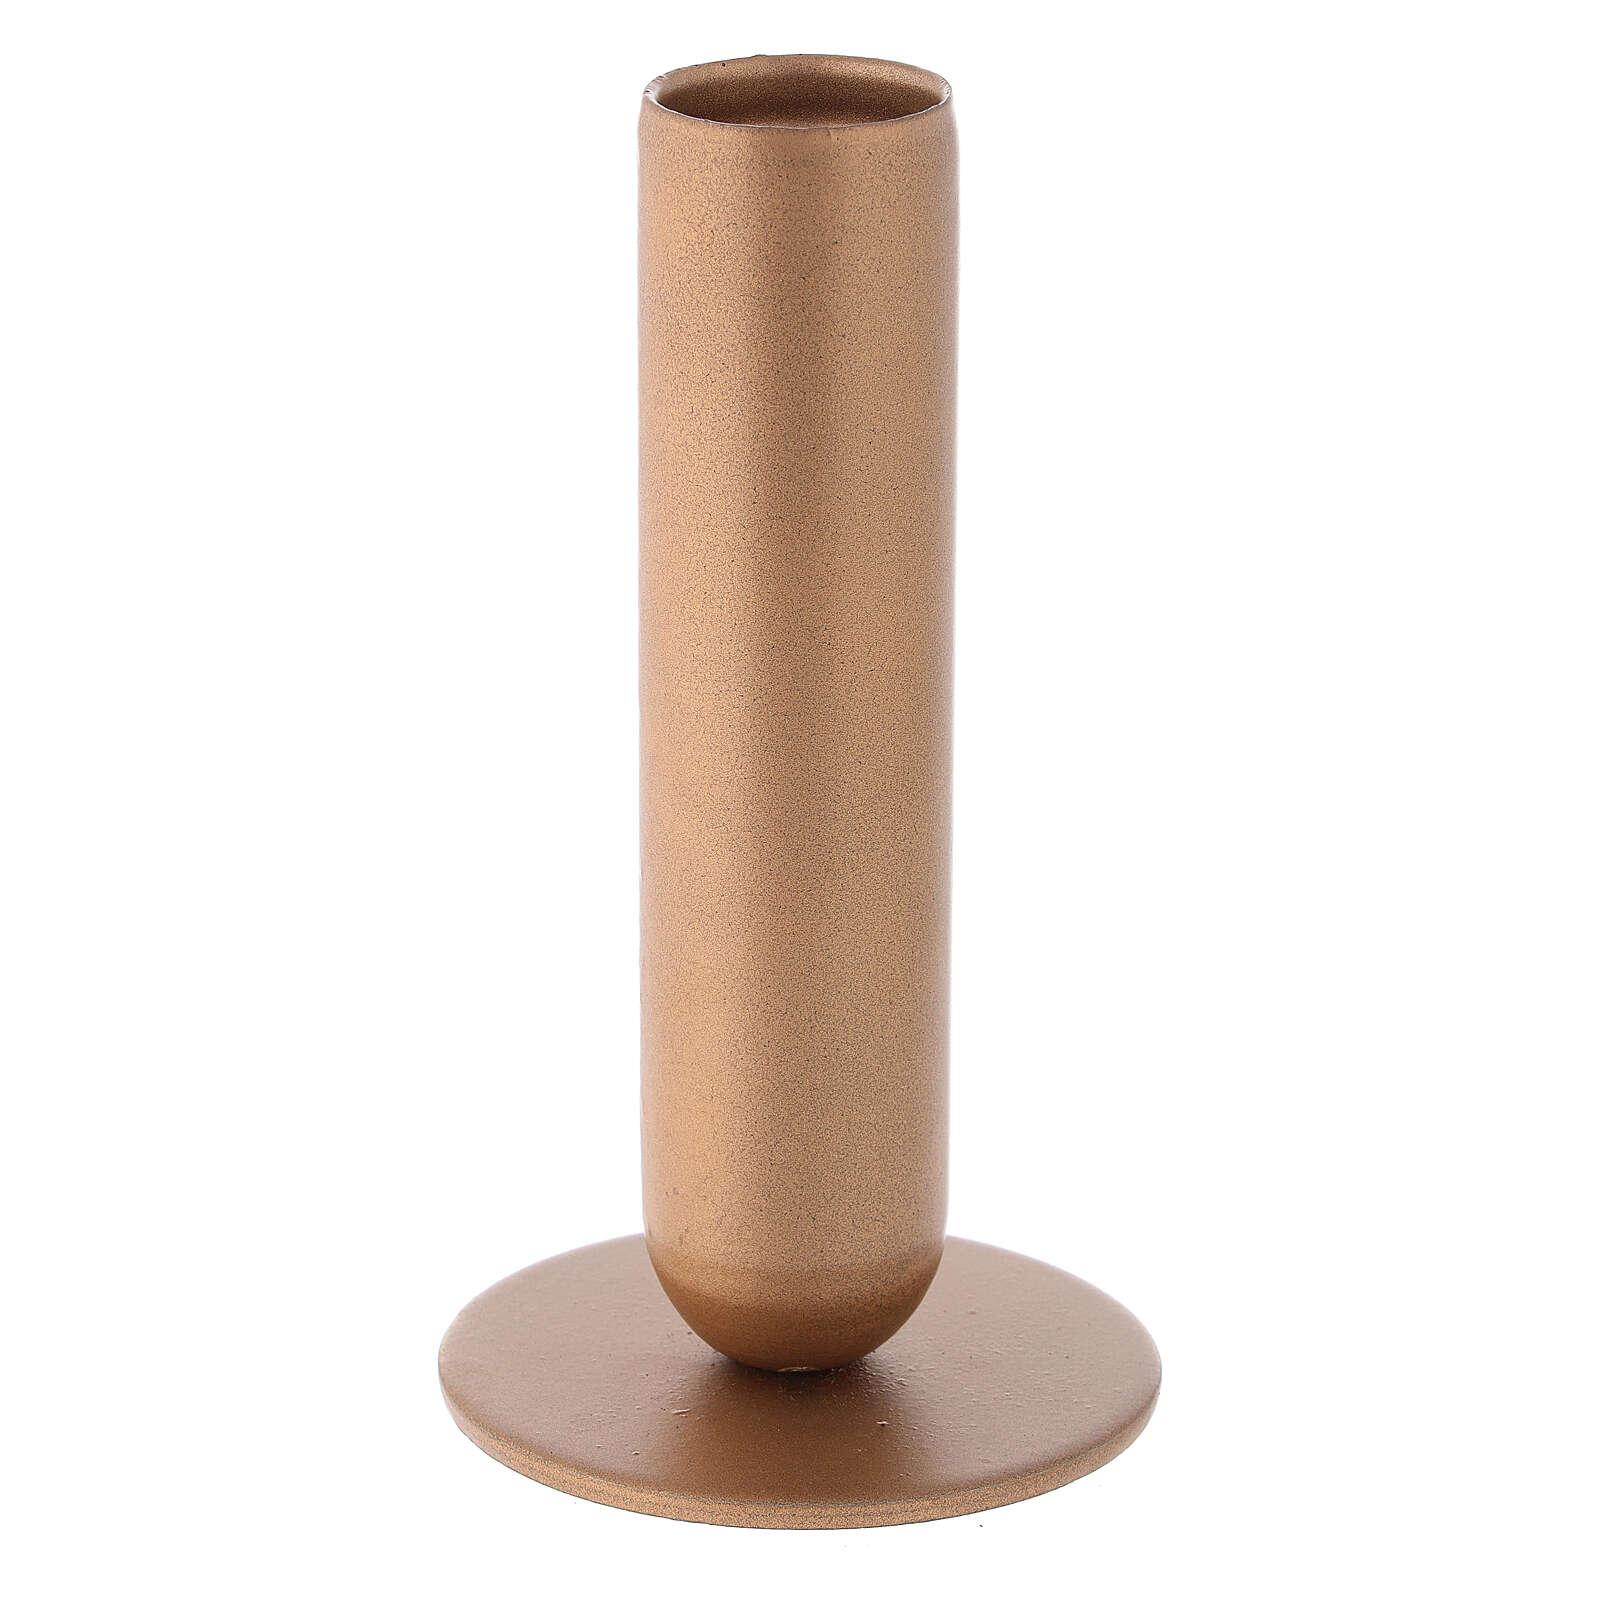 Porta-vela ferro dourado bocal alto h 12 cm 3